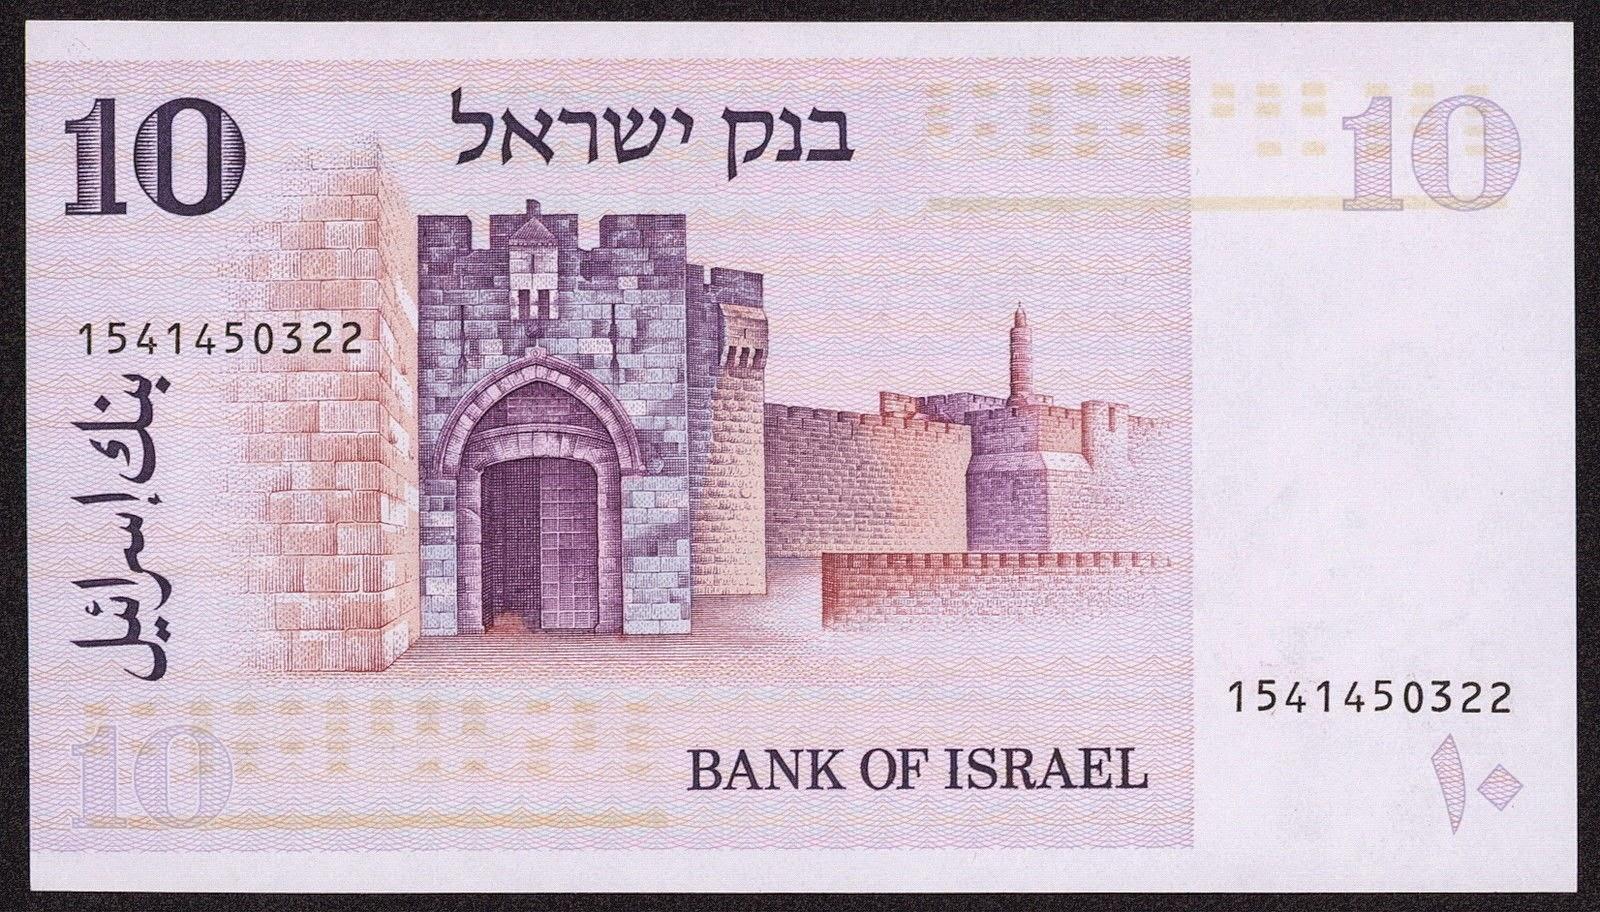 Israel Banknotes 10 Lirot Note 1973 Bank of Israel